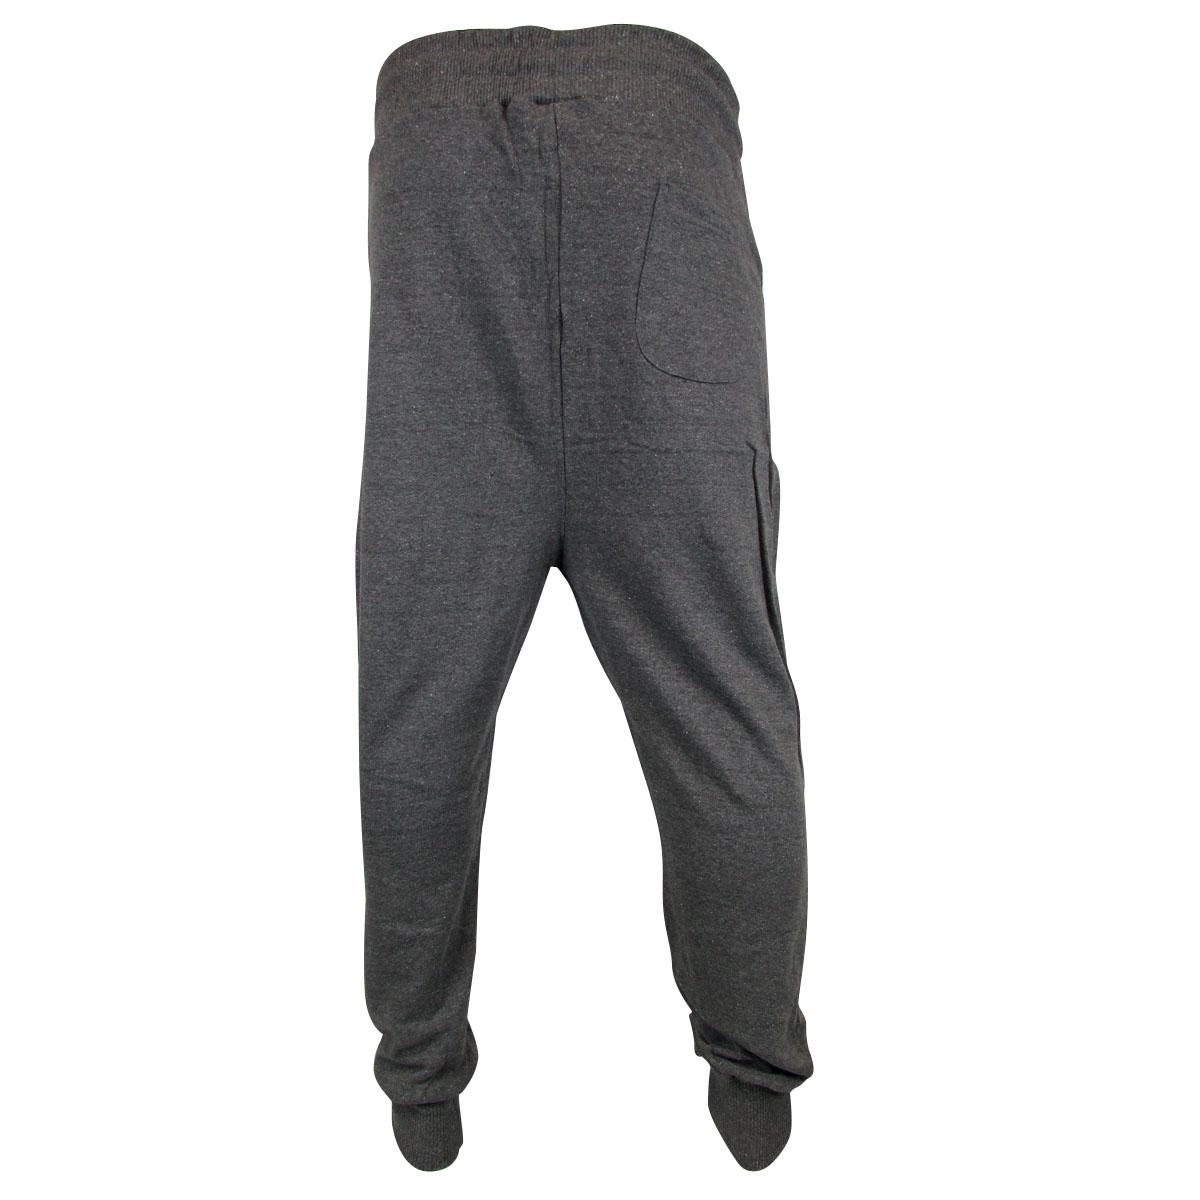 Awesome Mens Joggers Skinny Drop Crotch Cuffed Jogging Pants Tracksuit Bottoms Fleece | EBay